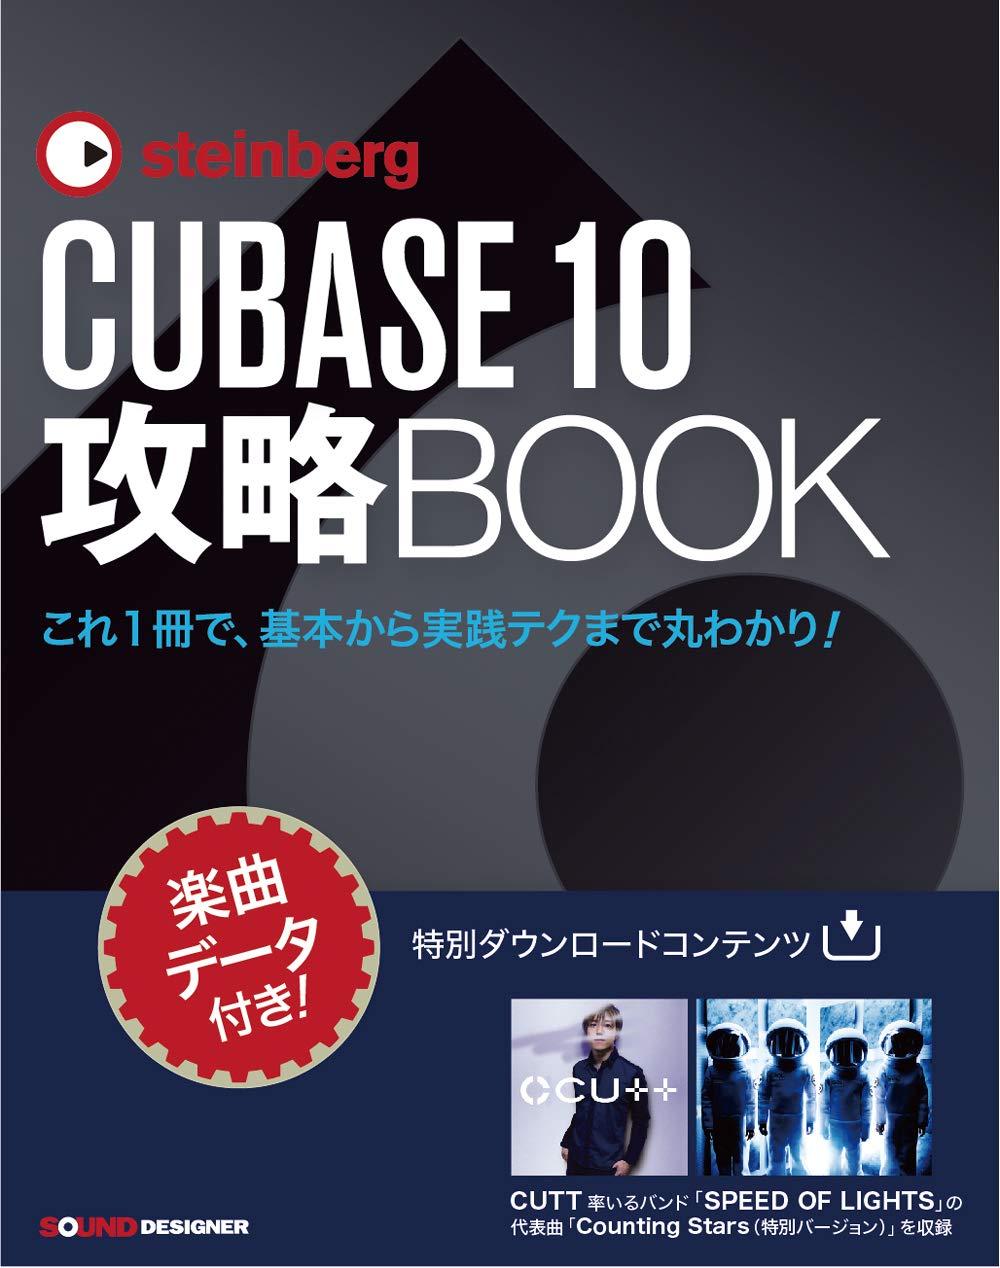 CUBASE PRO 10 攻略BOOK